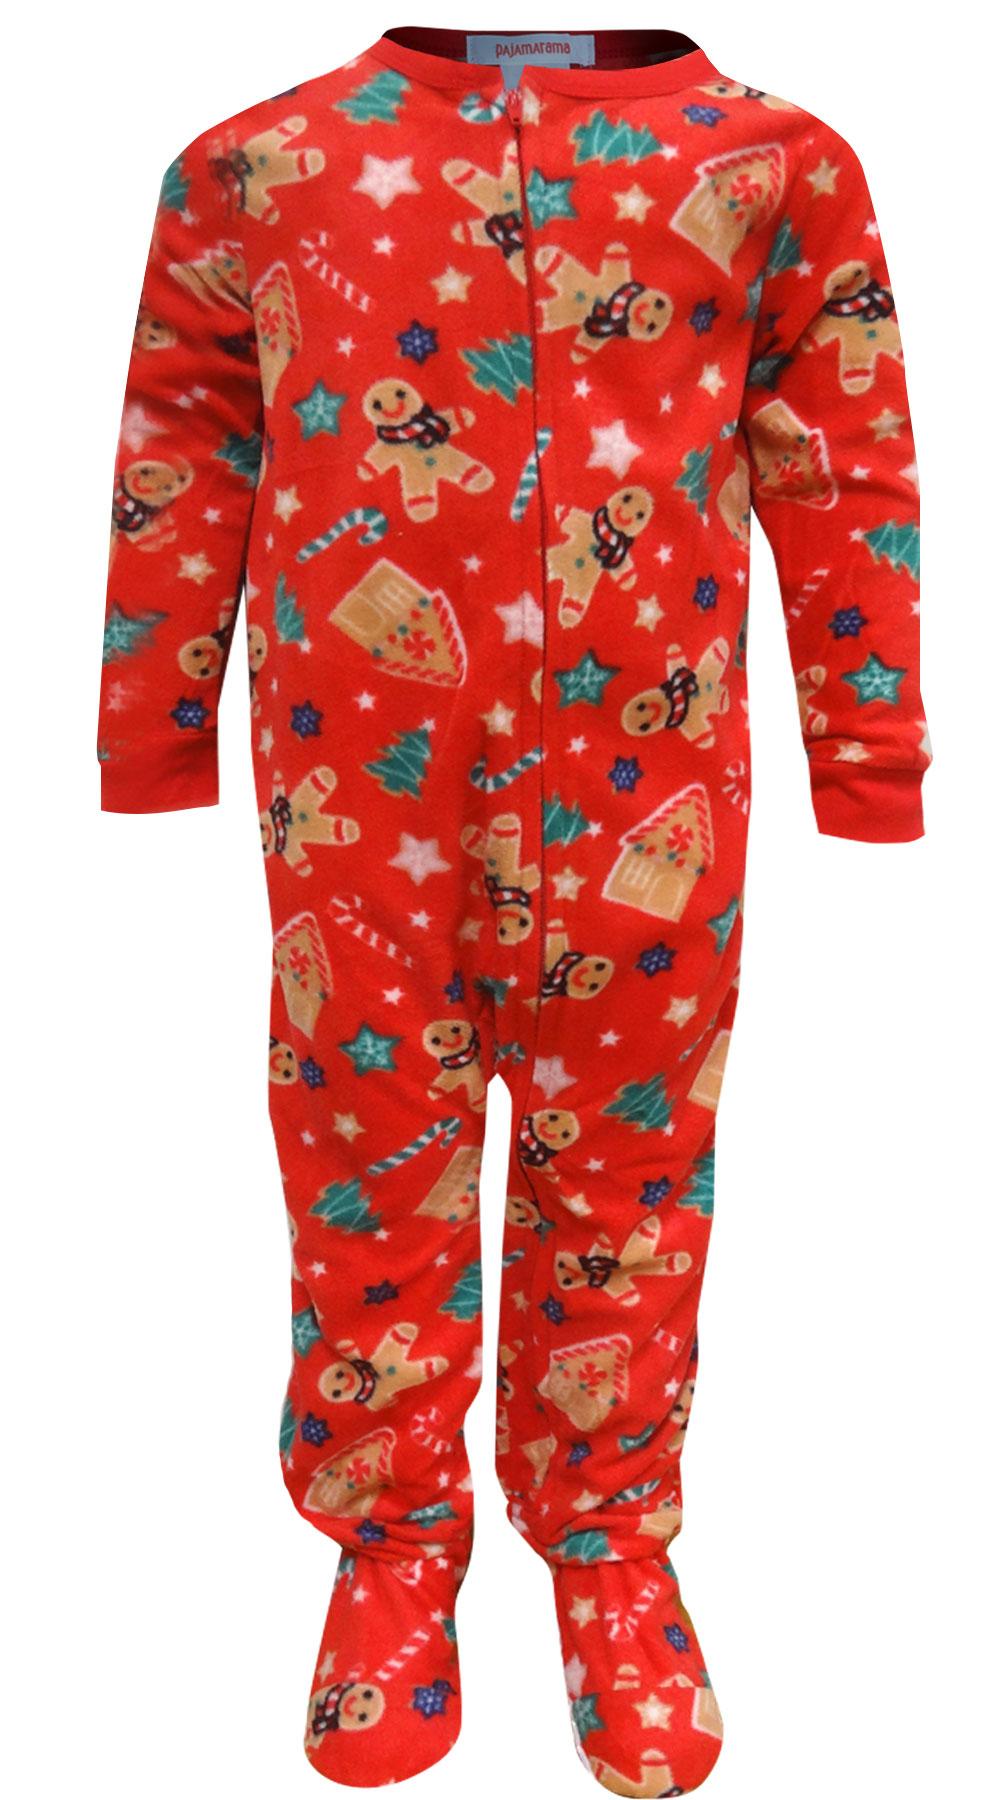 Image of Gingerbread Men Toddler Christmas Blanket Sleeper Pajama for boys